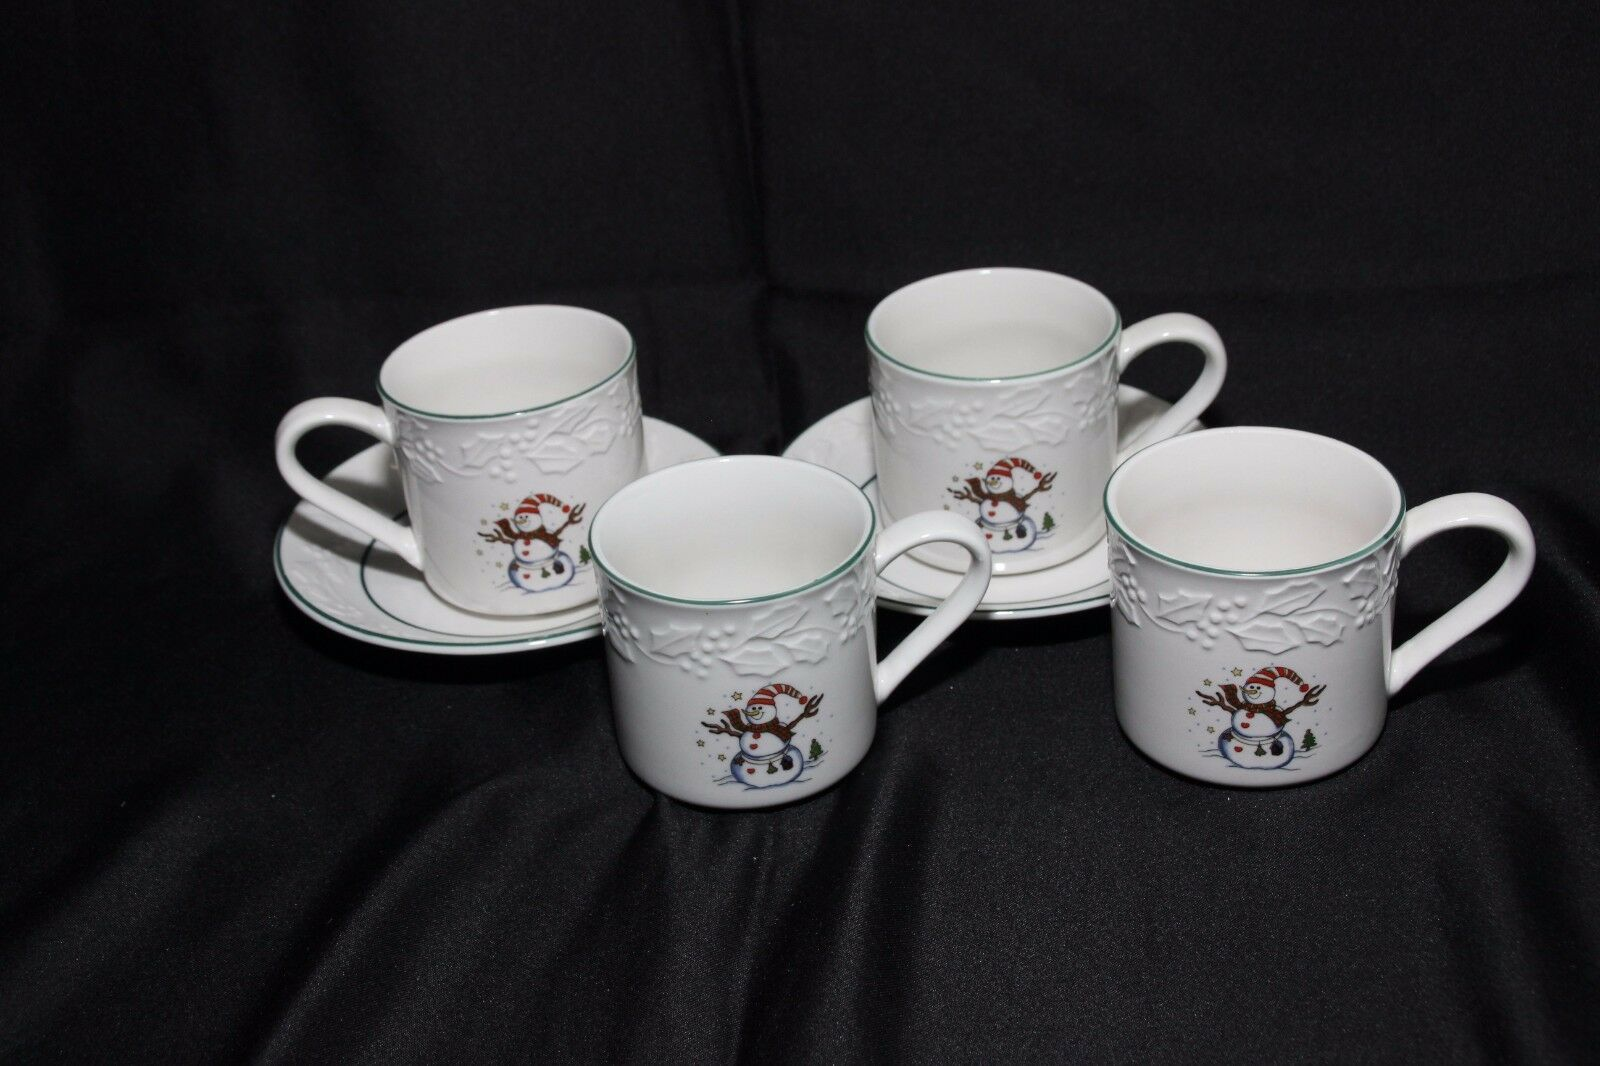 GEI Snowman Xmas 4 Cups 2 Saucers